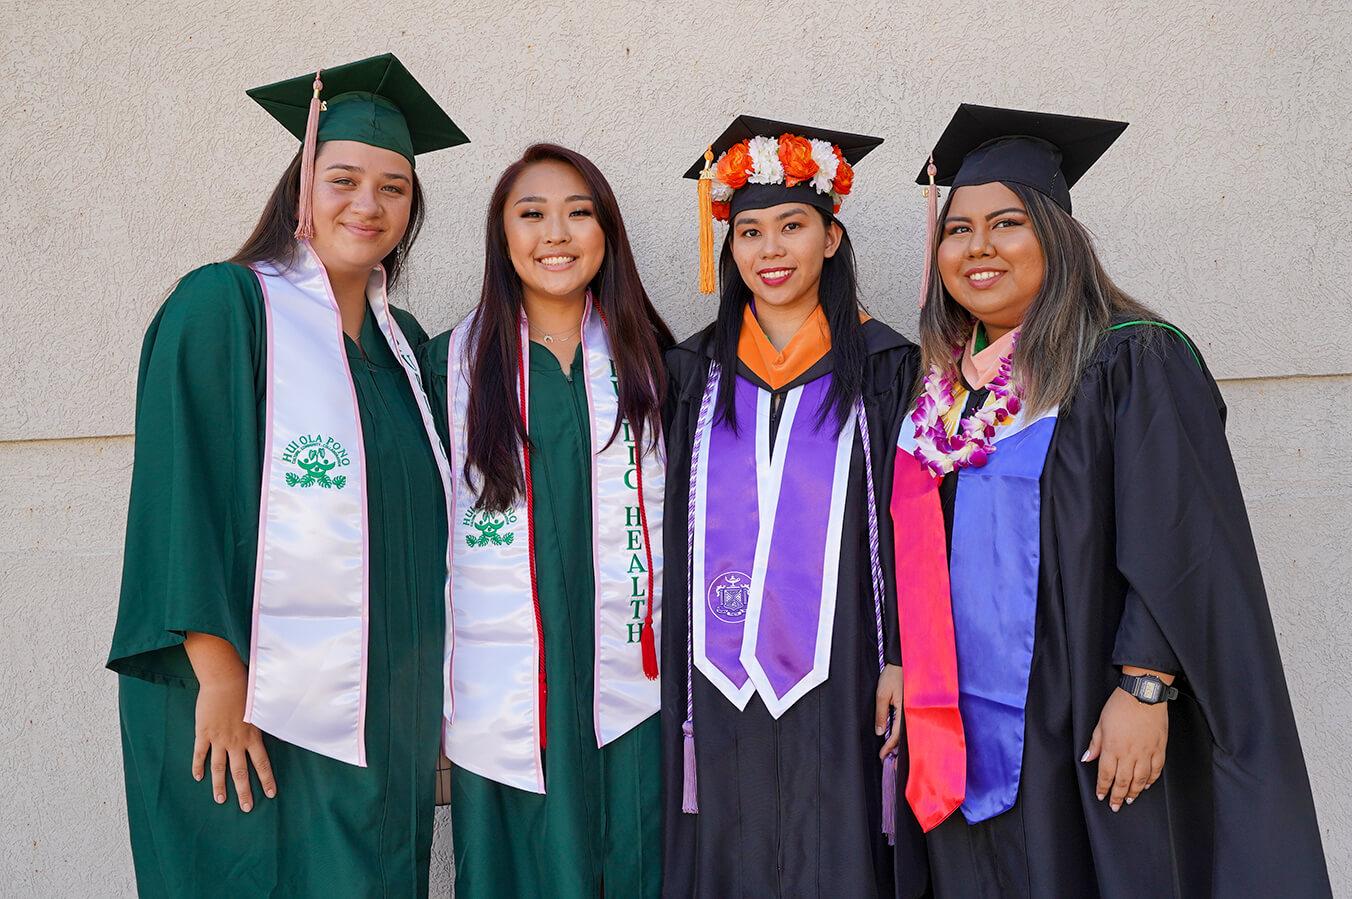 Four UH Manoa students in their graduation regalia